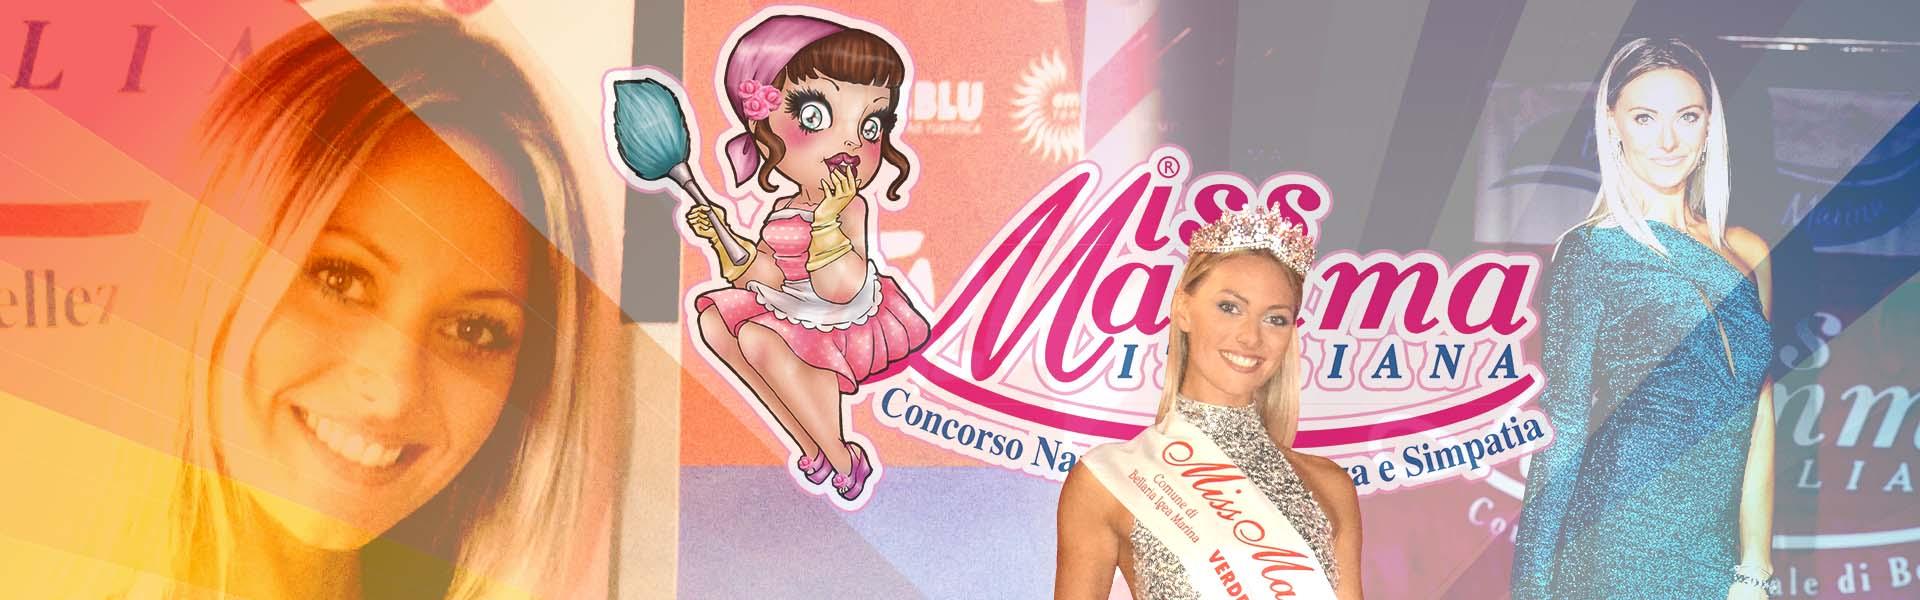 Miss-Mamma-Italiana-2021-banner-home